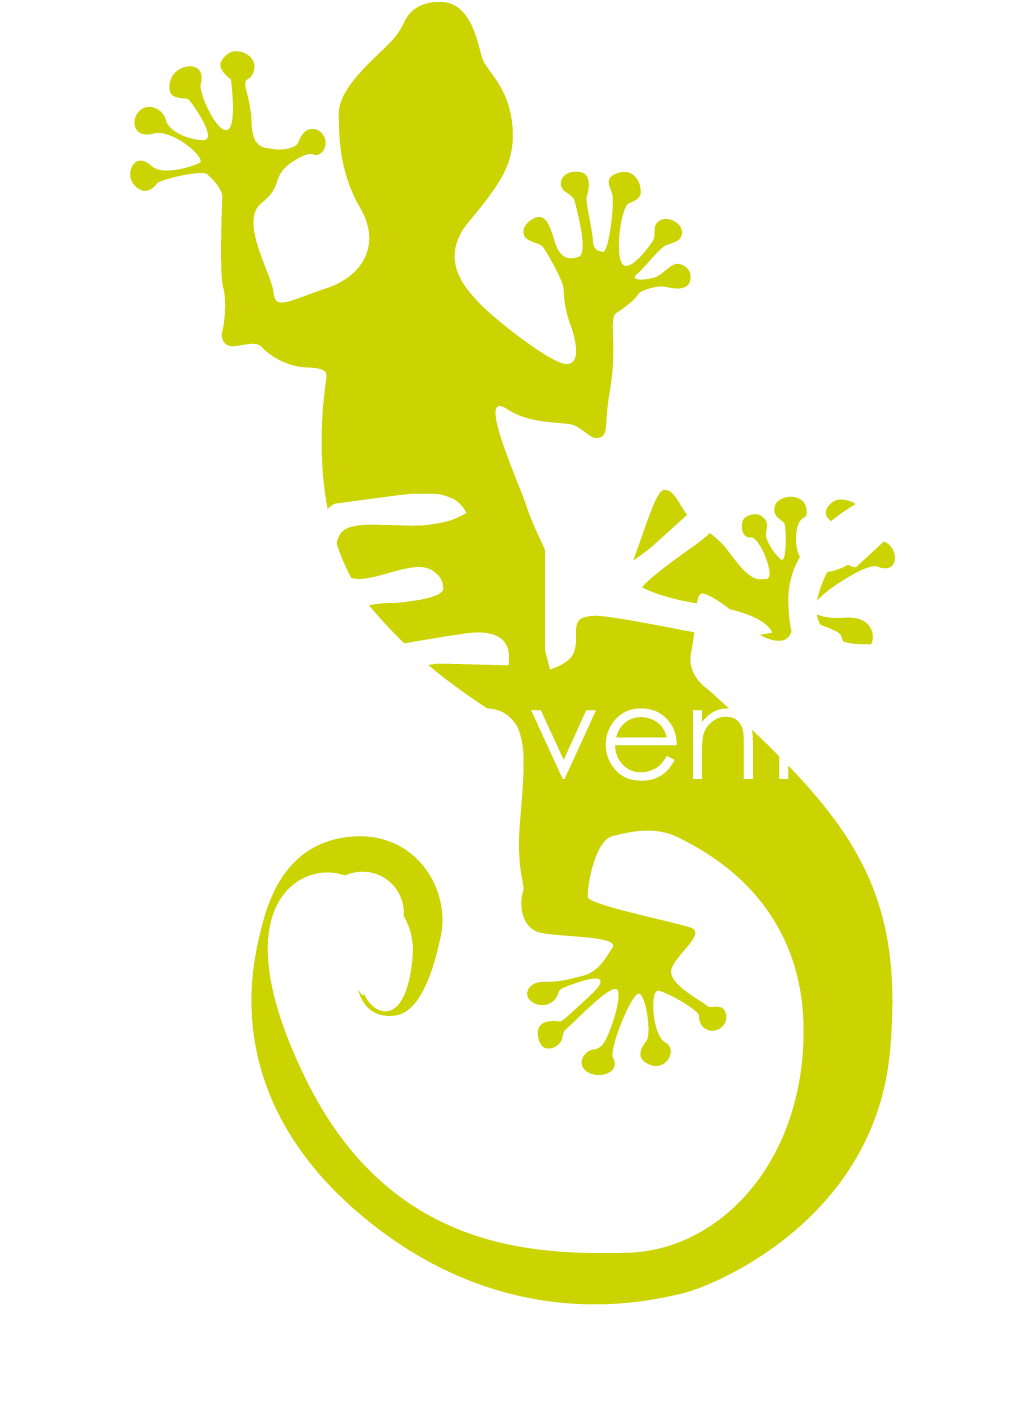 logo GEKO for EVENTS bianco